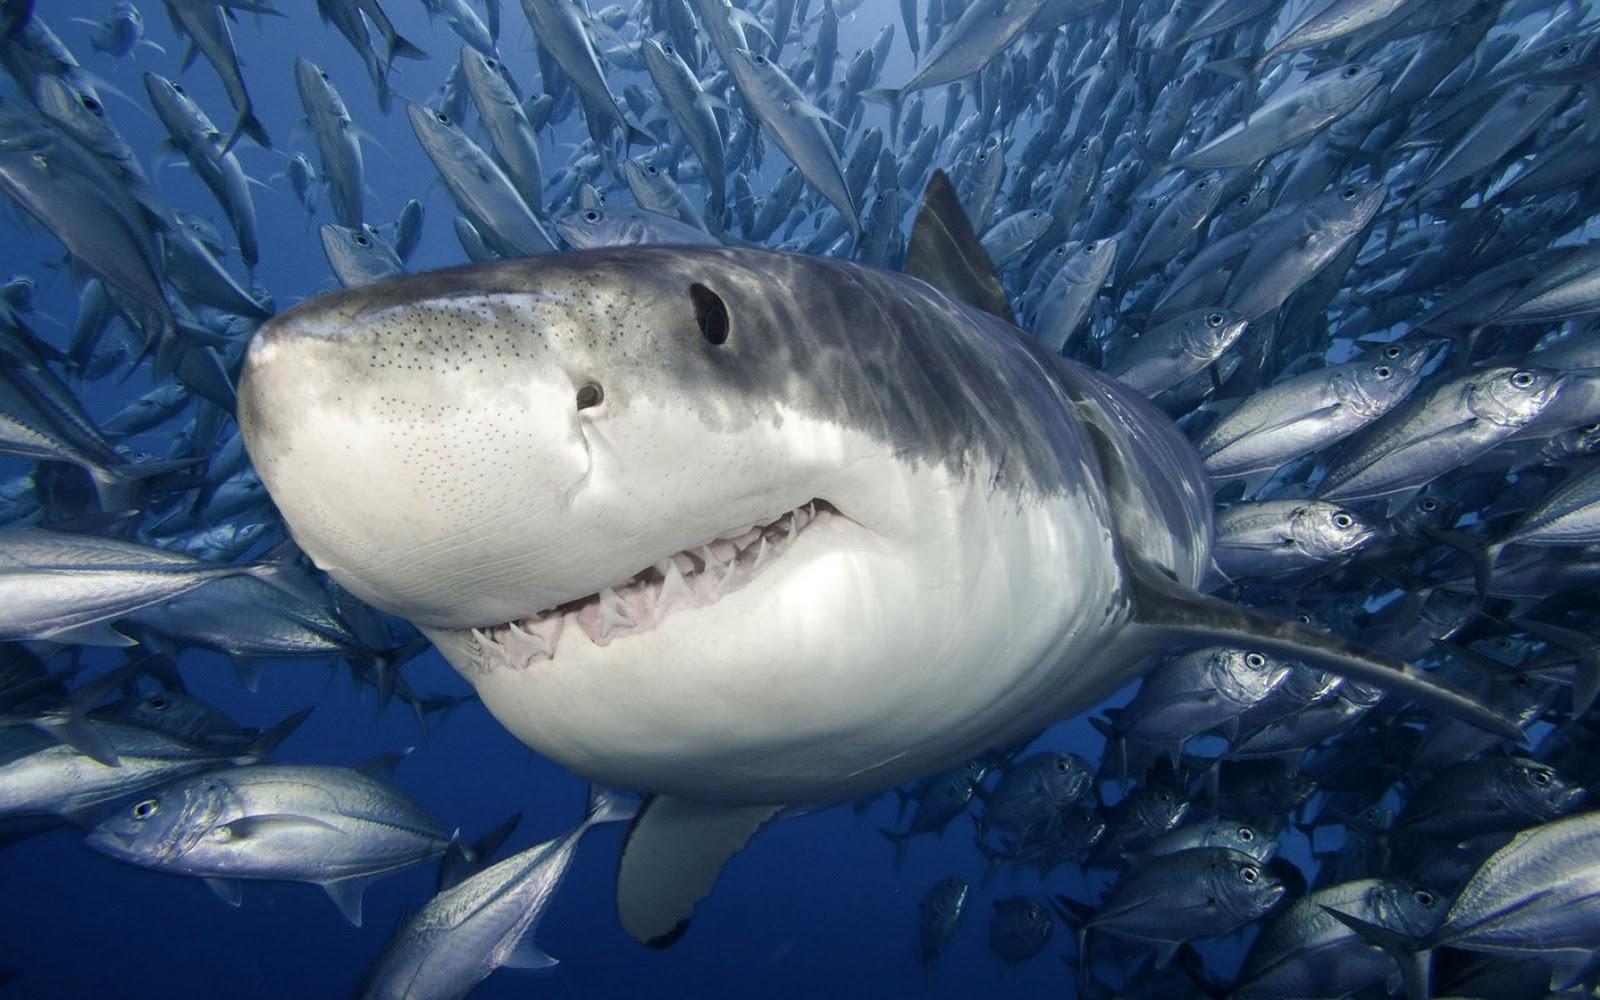 49+ Shark Live Wallpaper Windows 8 on WallpaperSafari